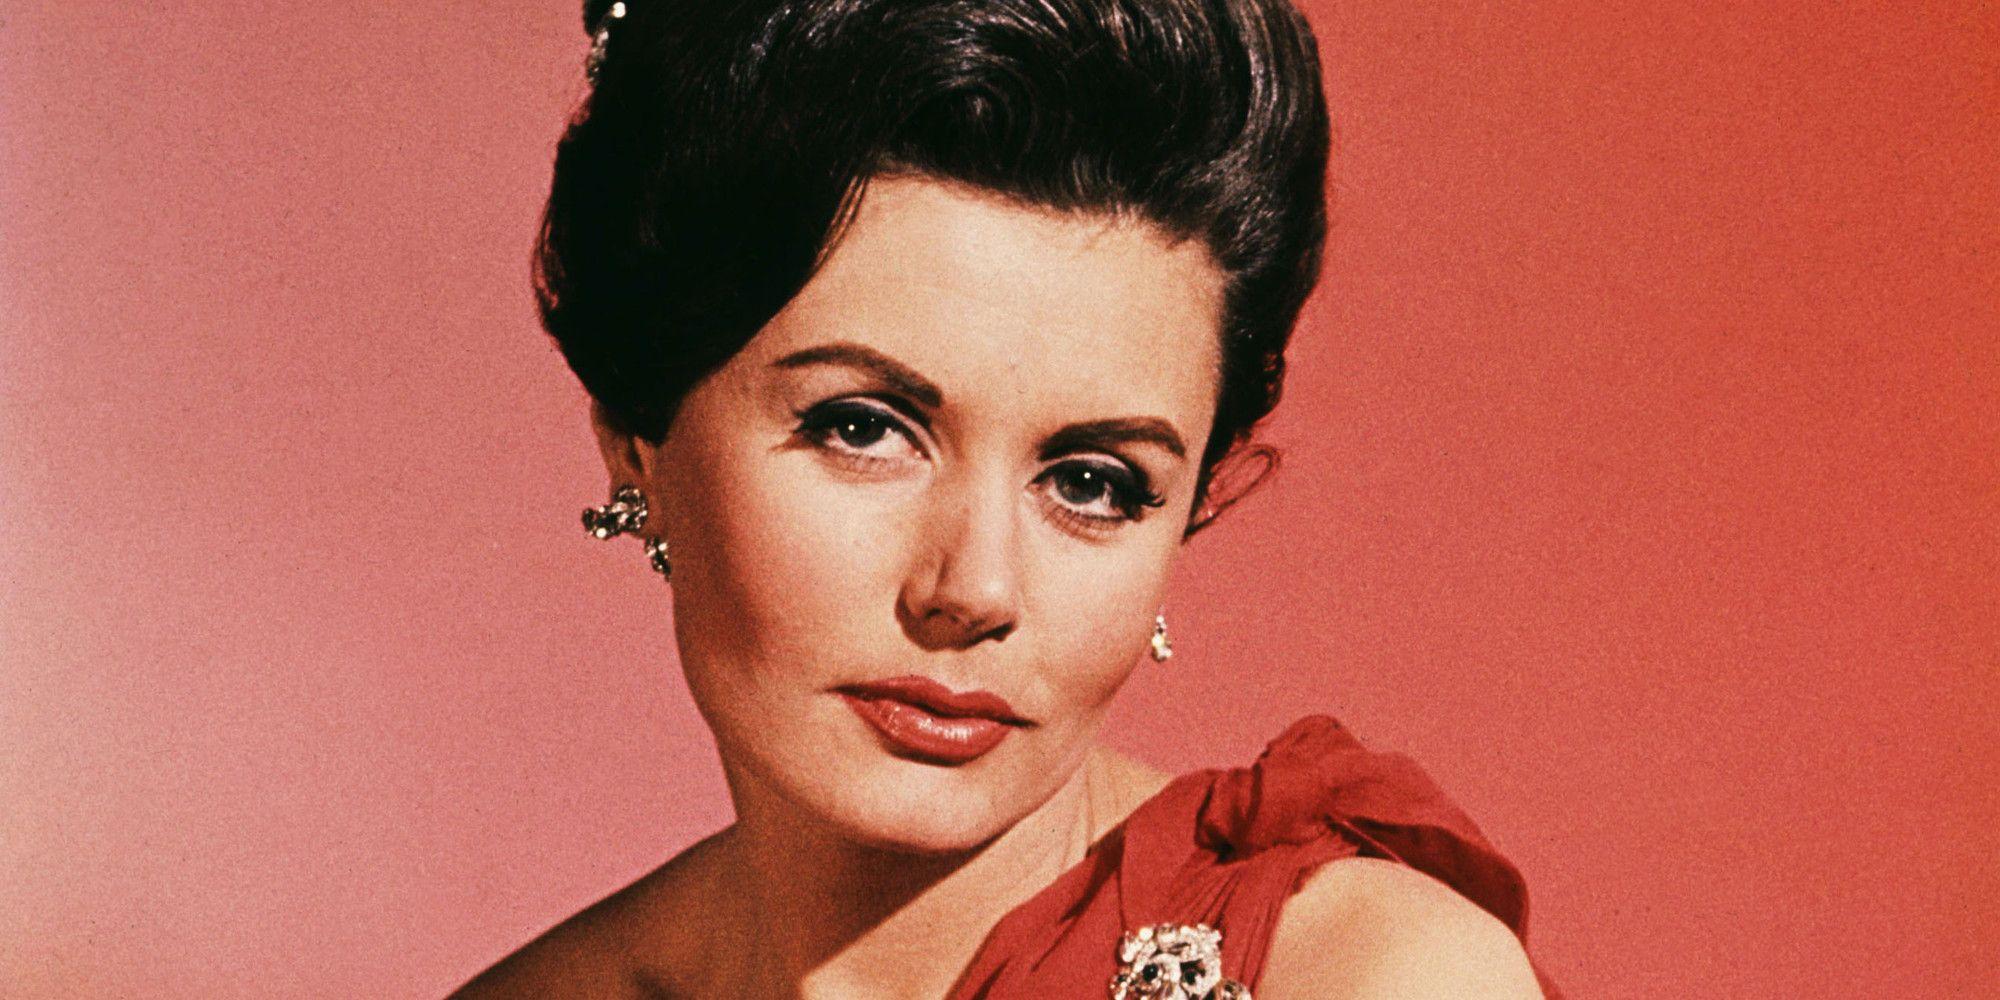 Original Bond Girl Eunice Gayson Dies at 90